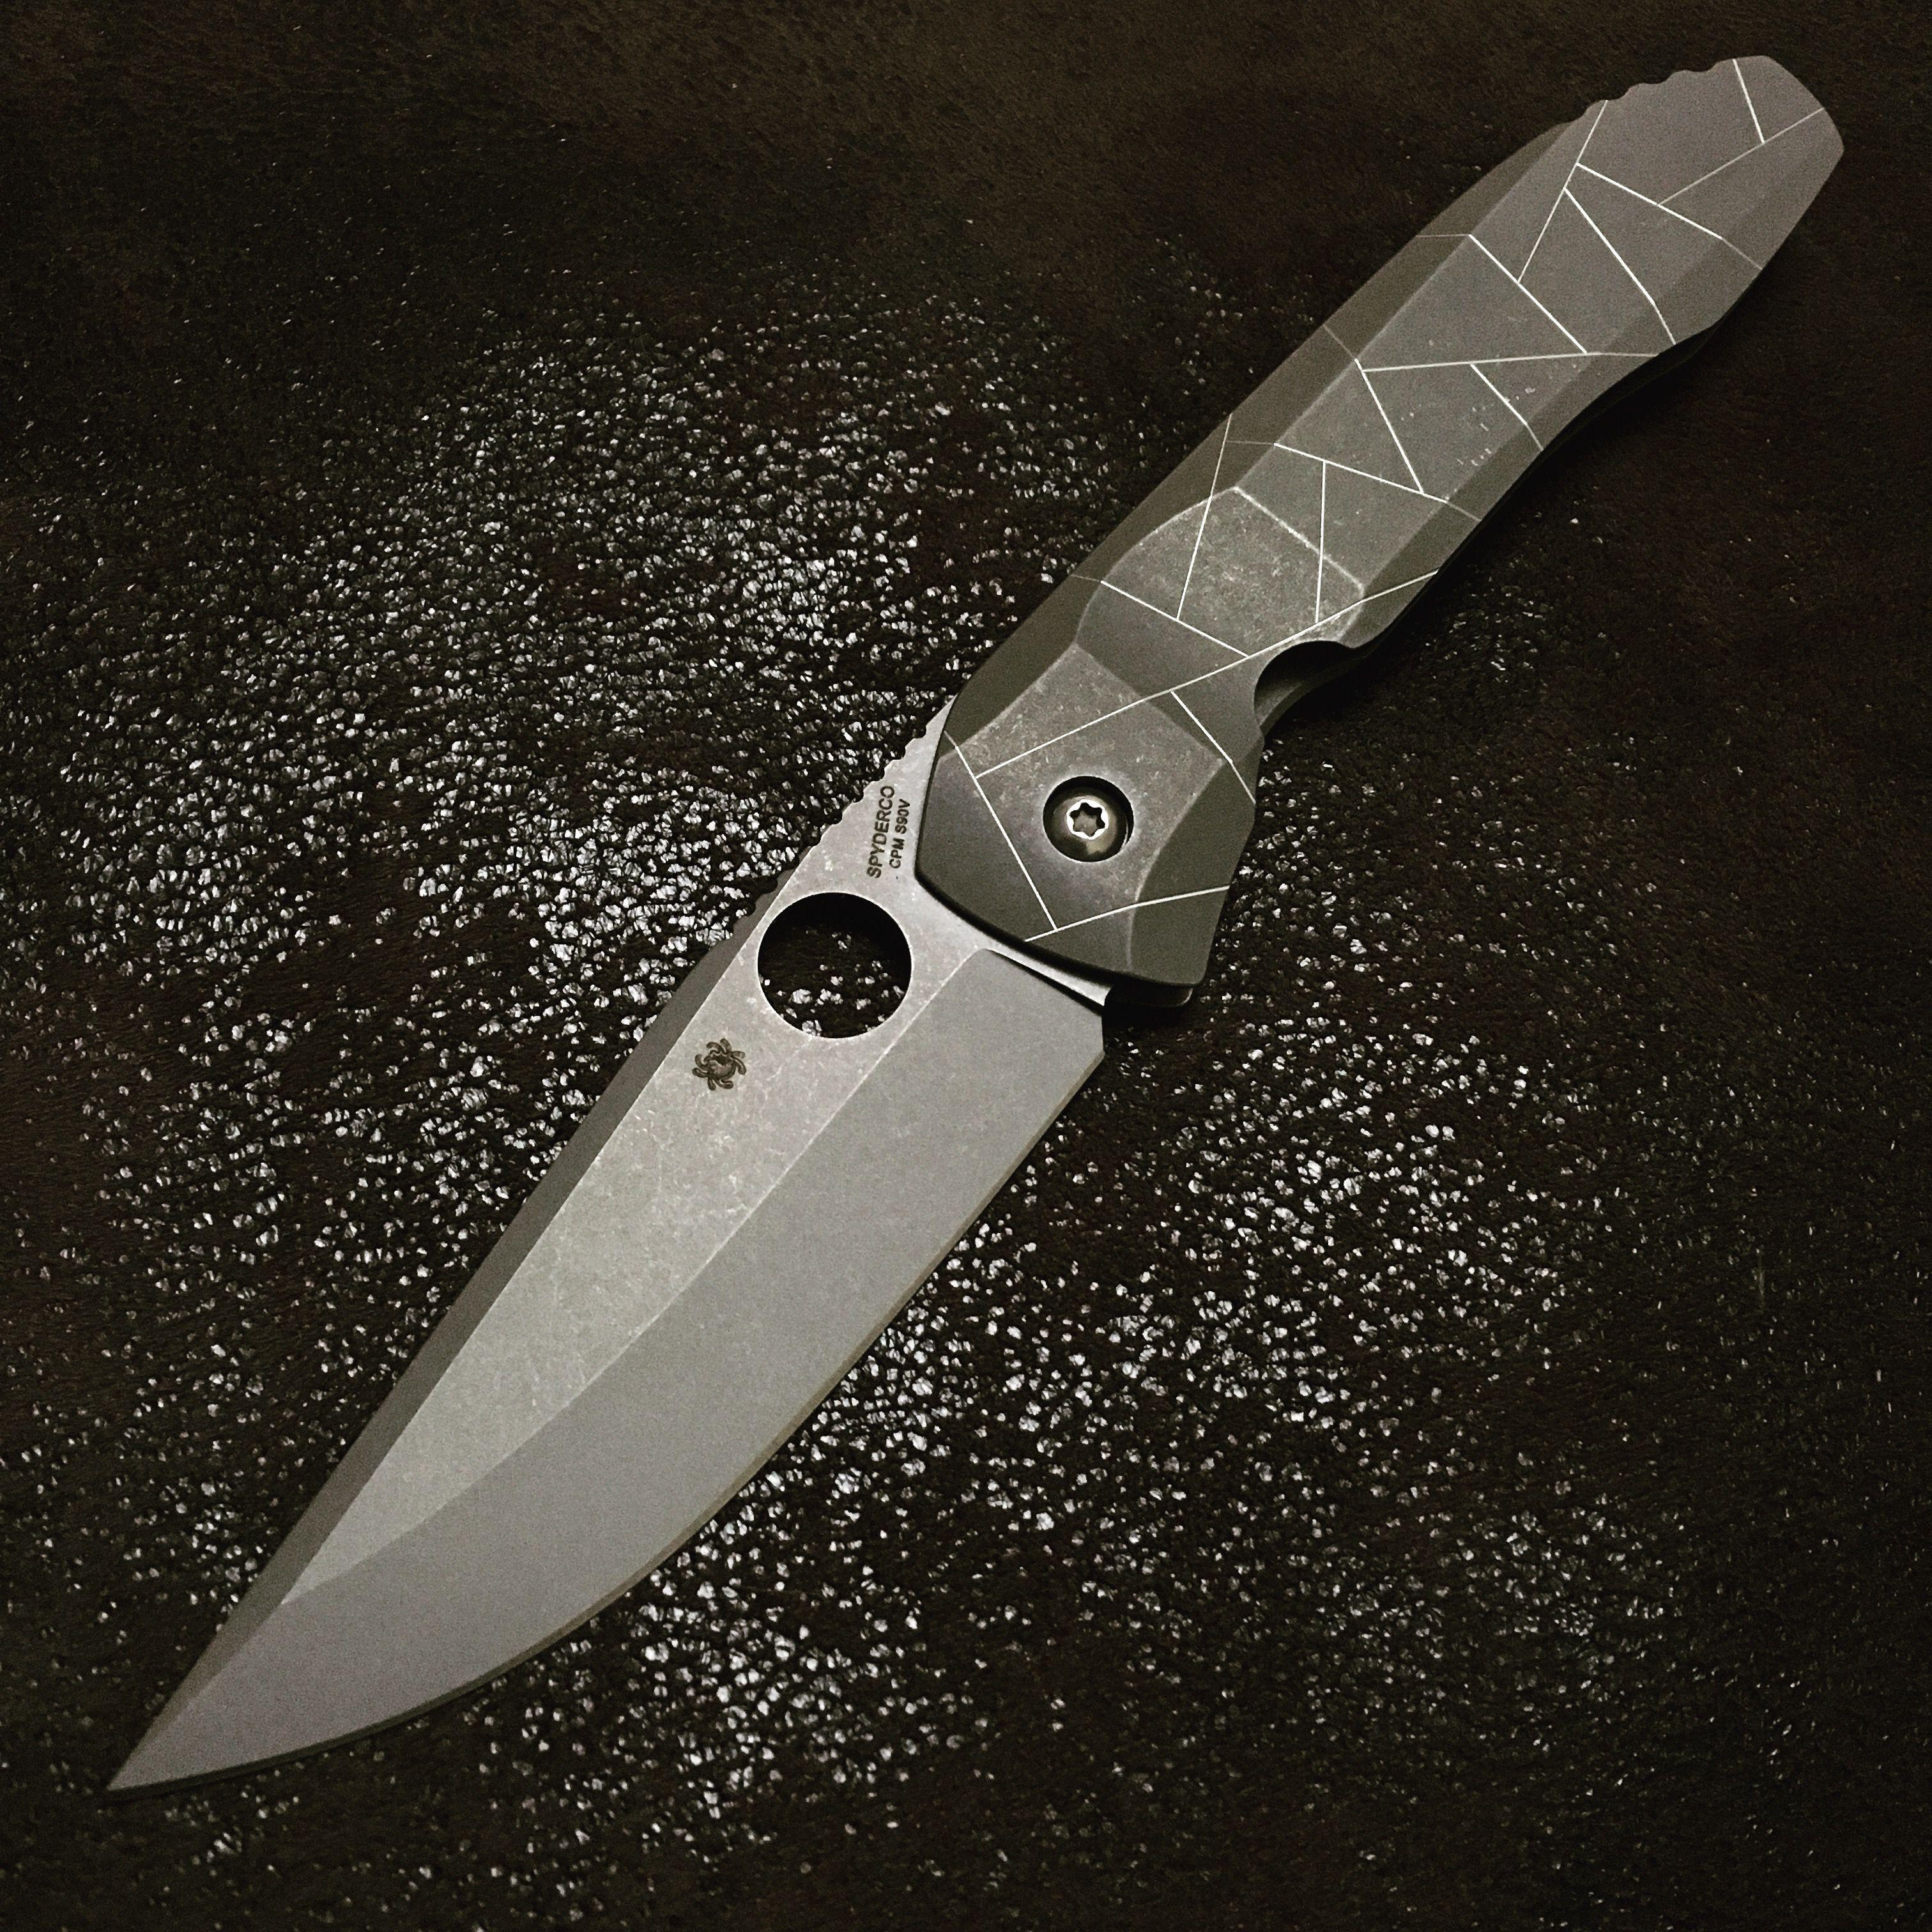 Spyderco Nirvana Spyderco Knife Spyderco Knives